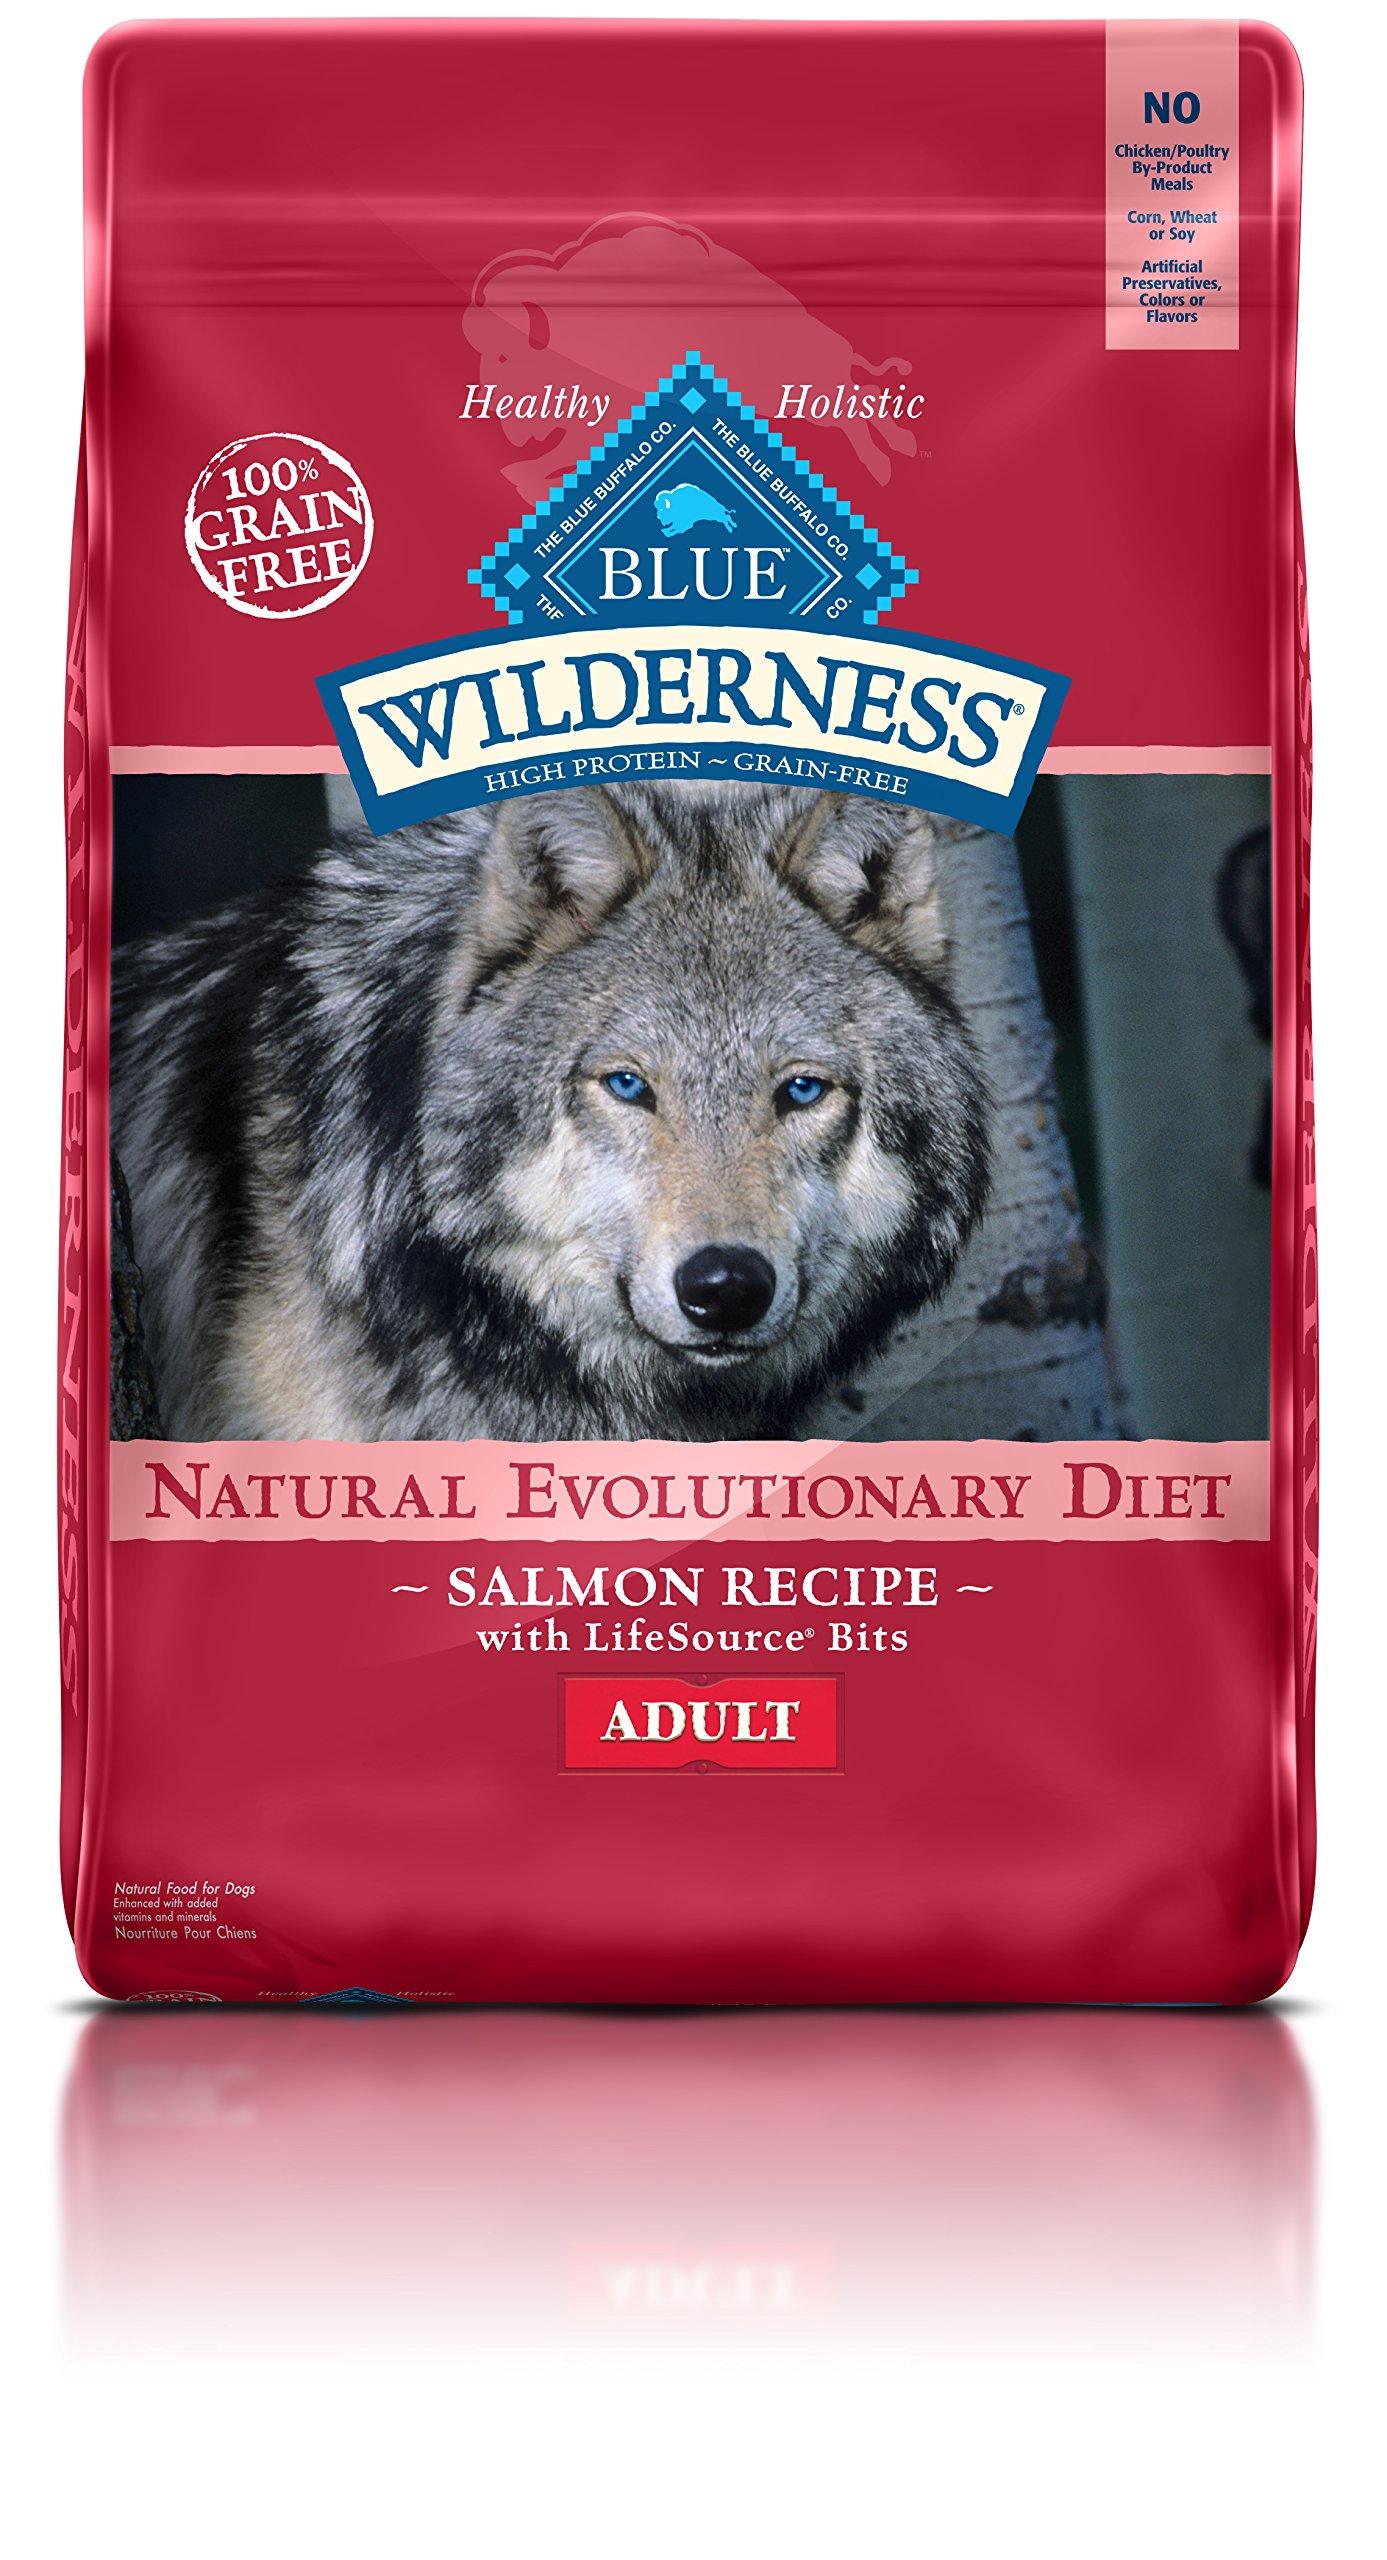 Lowest Price On Blue Buffalo Salmon Dog Food